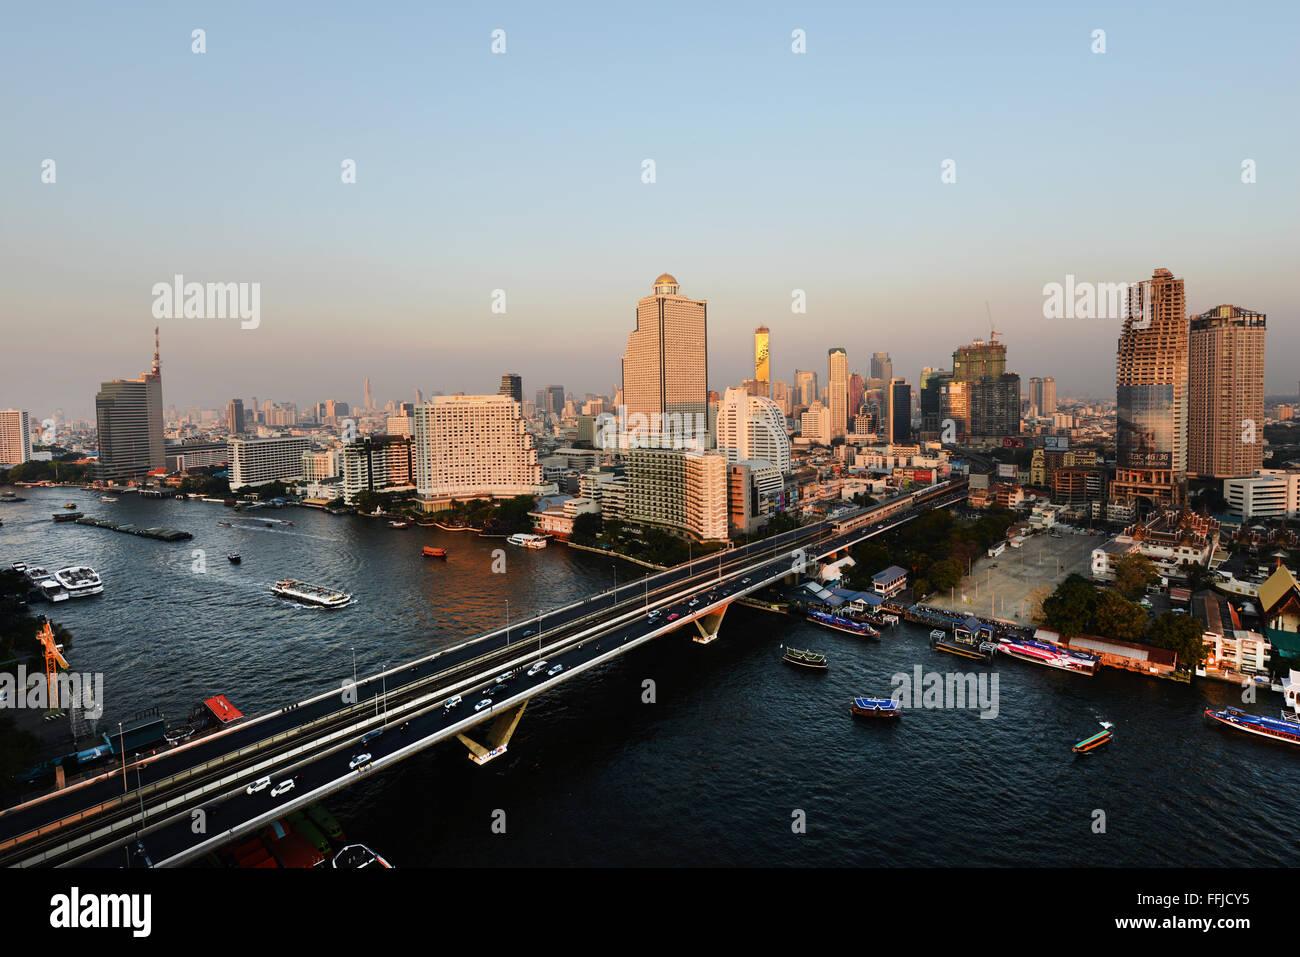 A beautiful view of Bangkok during sunset. - Stock Image